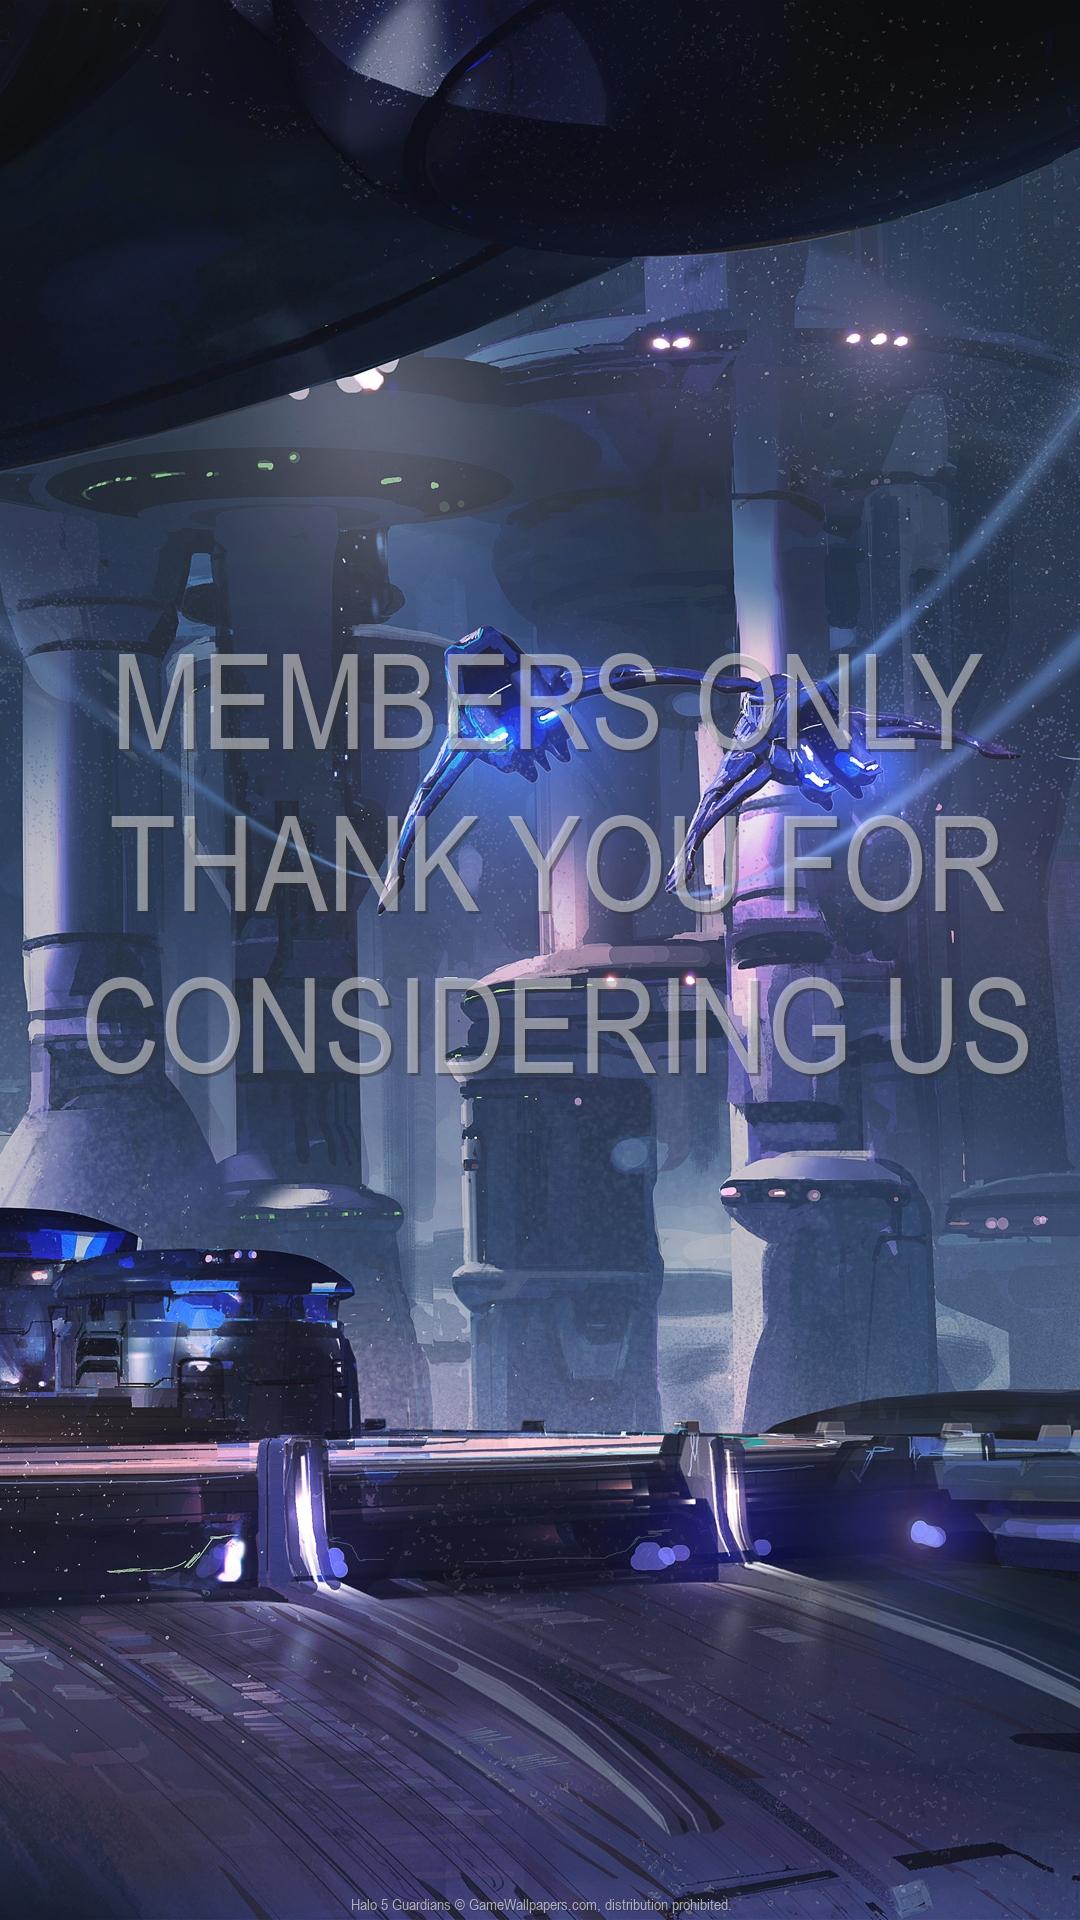 Halo 5: Guardians 1920x1080 Handy Hintergrundbild 06